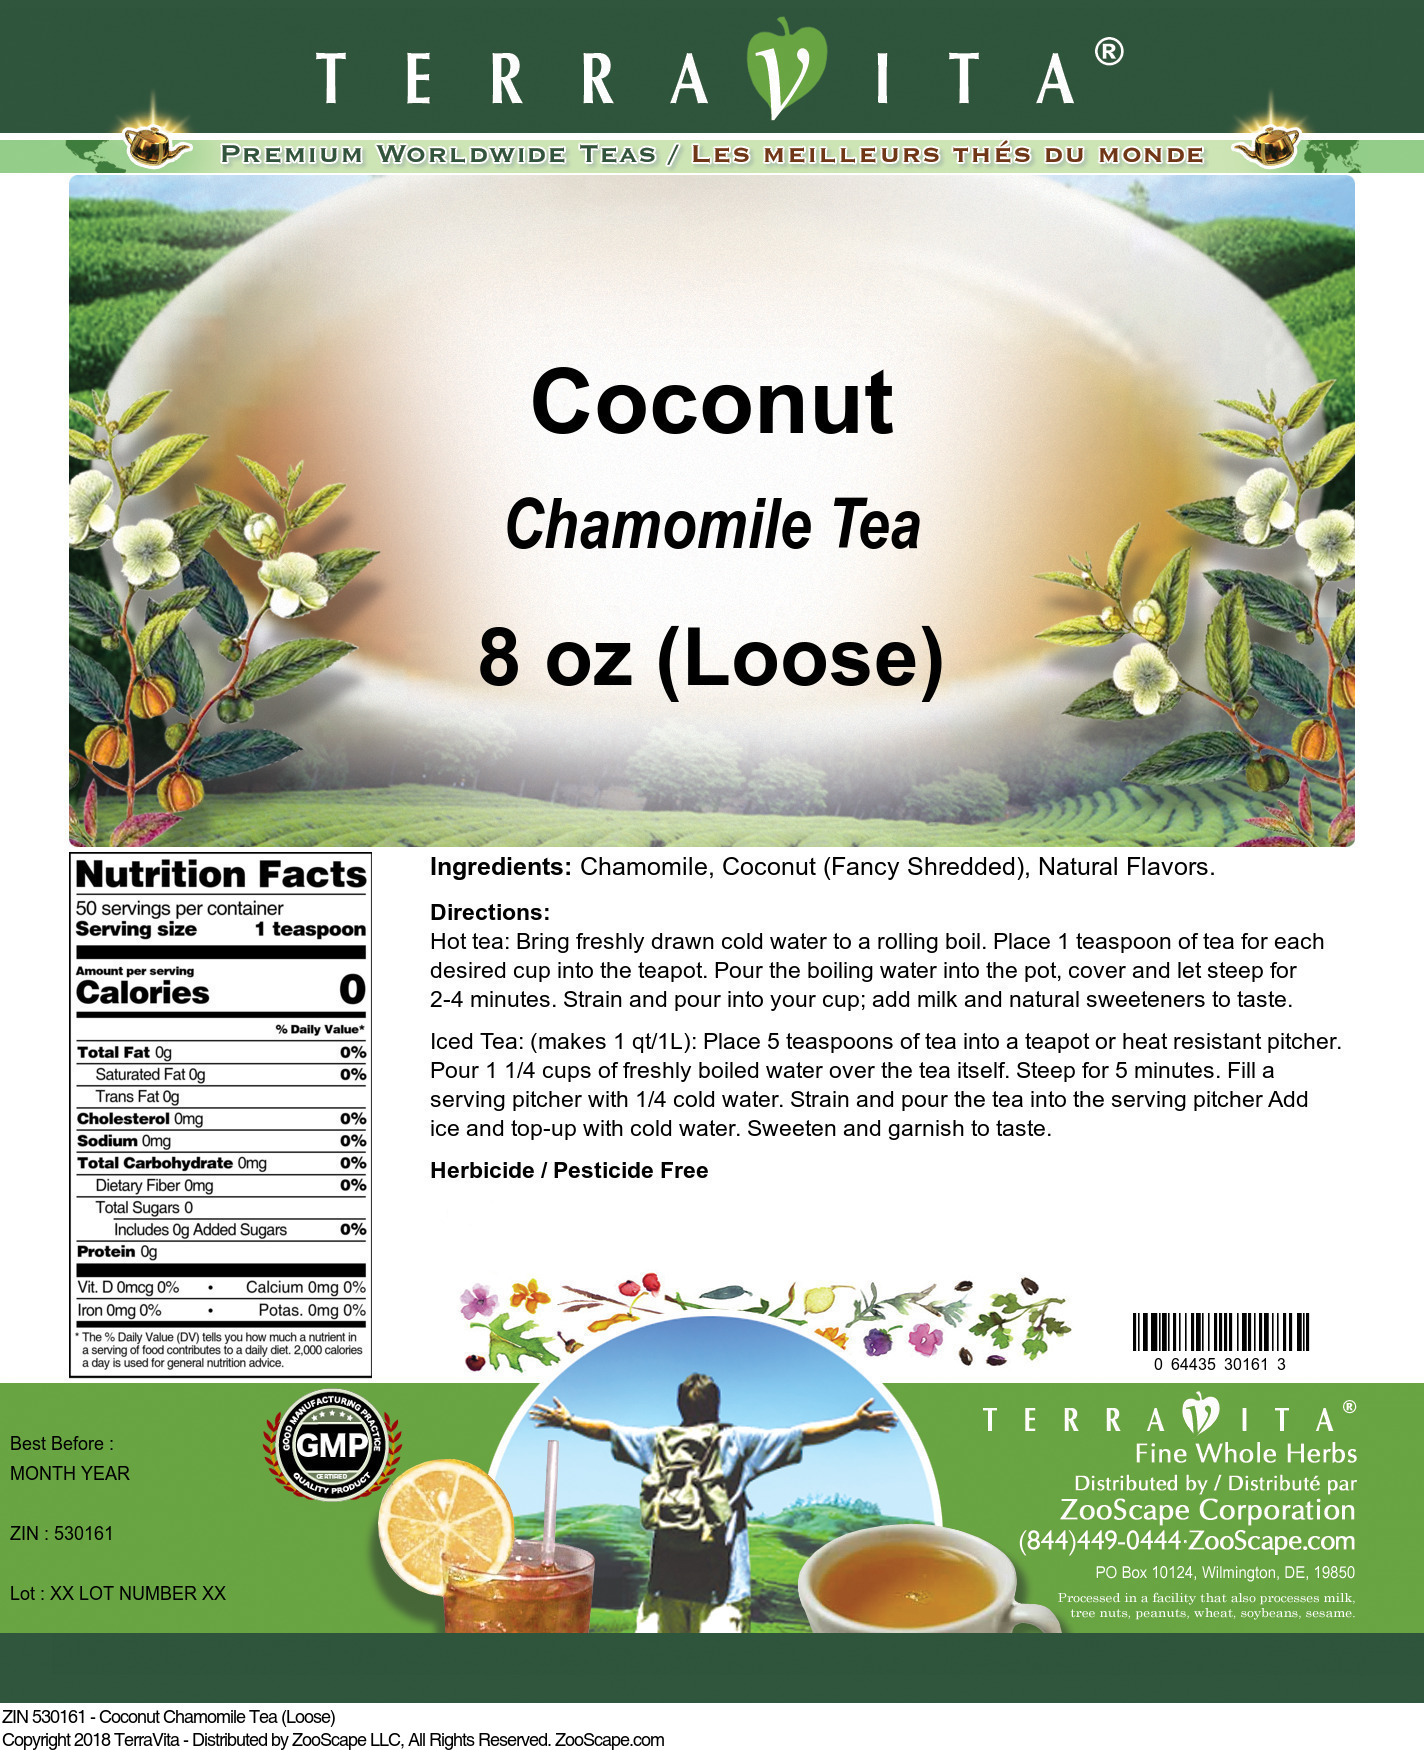 Coconut Chamomile Tea (Loose)